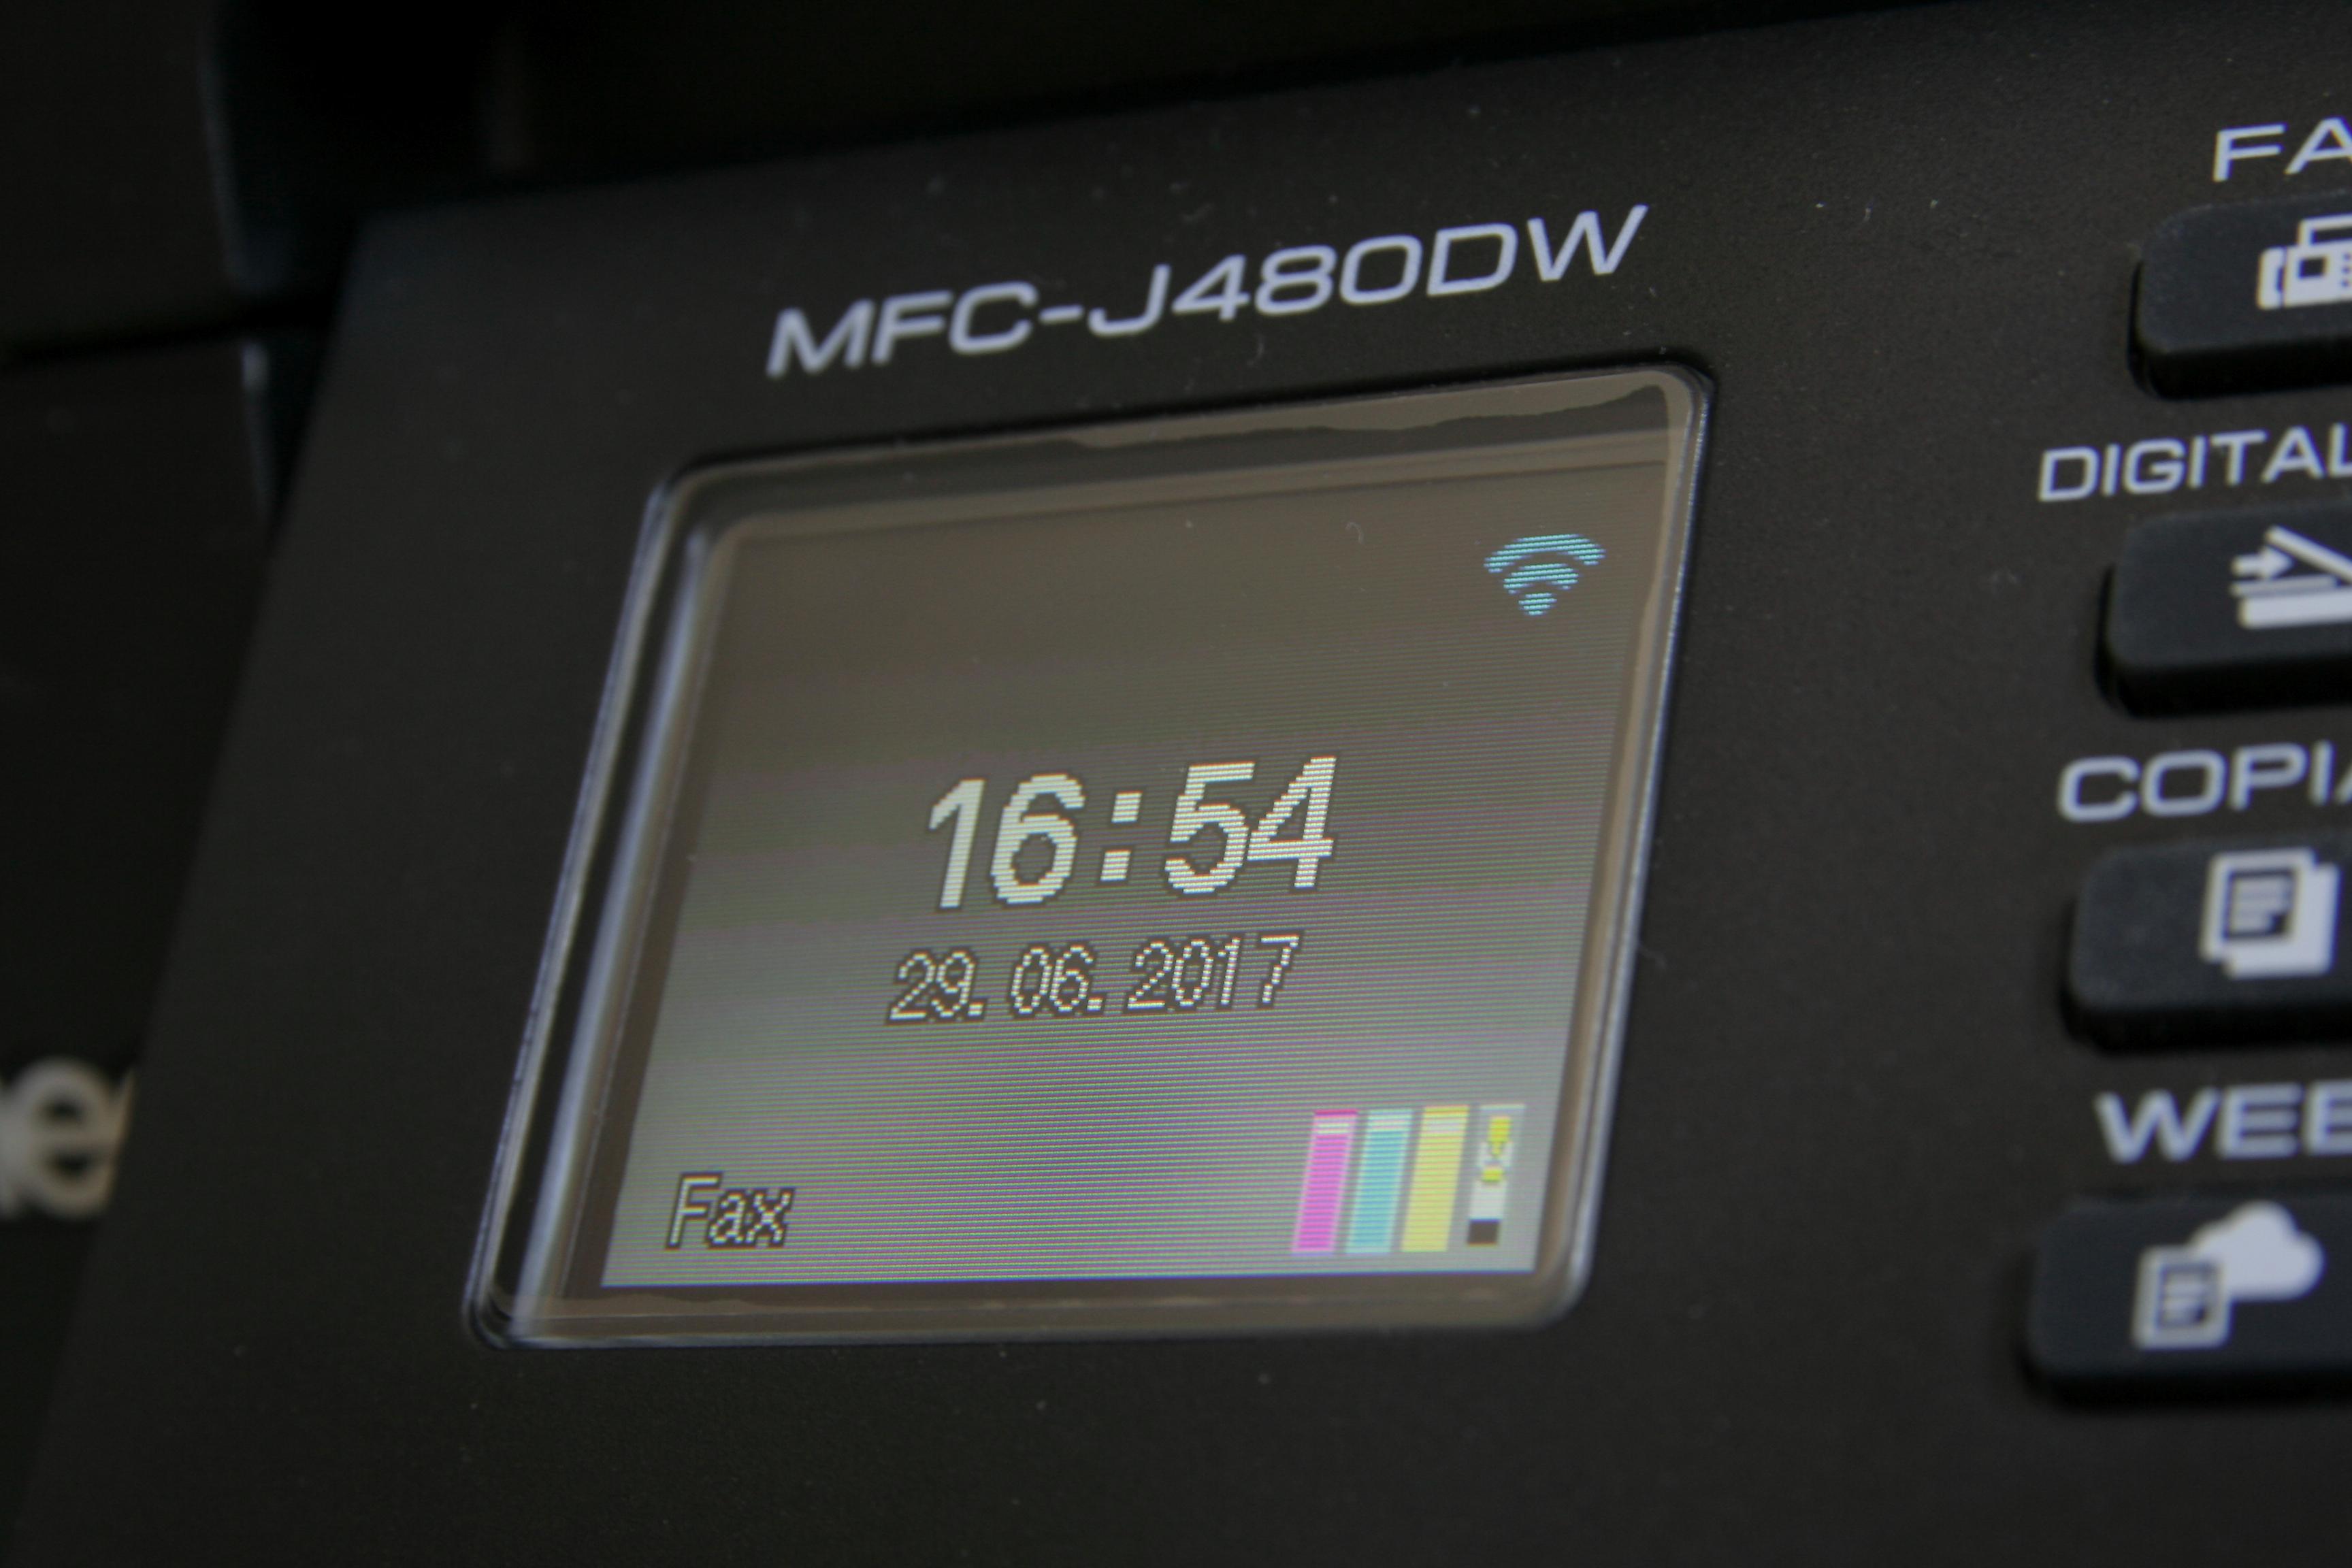 Detalle de la pantalla de la impresora Brother mostrando un mensaje de tinta negra baja